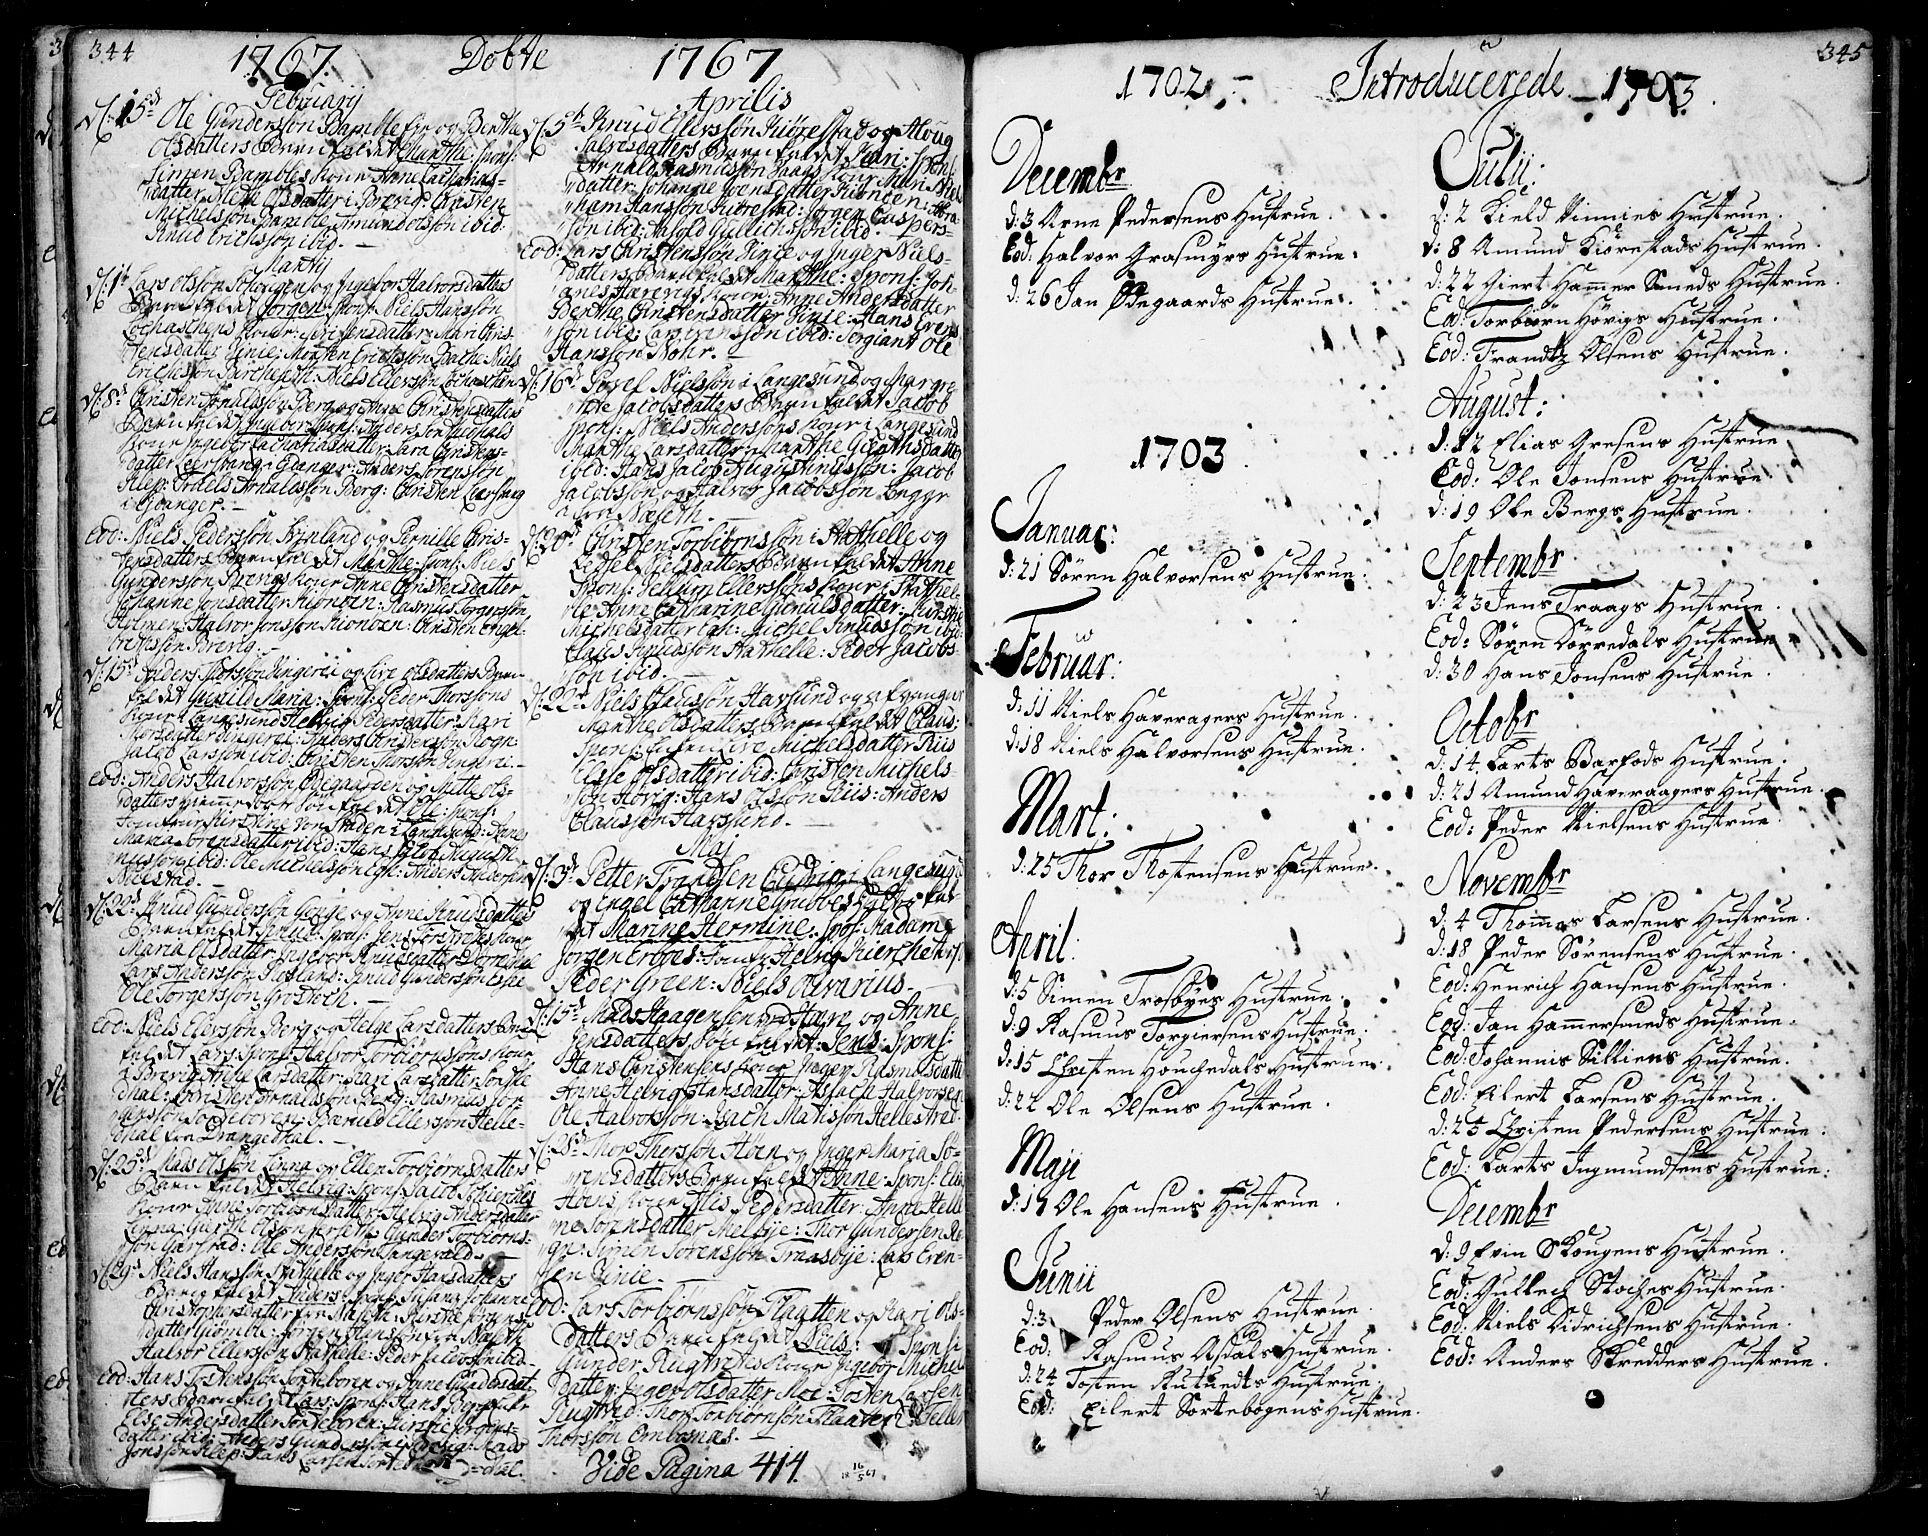 SAKO, Bamble kirkebøker, F/Fa/L0001: Ministerialbok nr. I 1, 1702-1774, s. 344-345